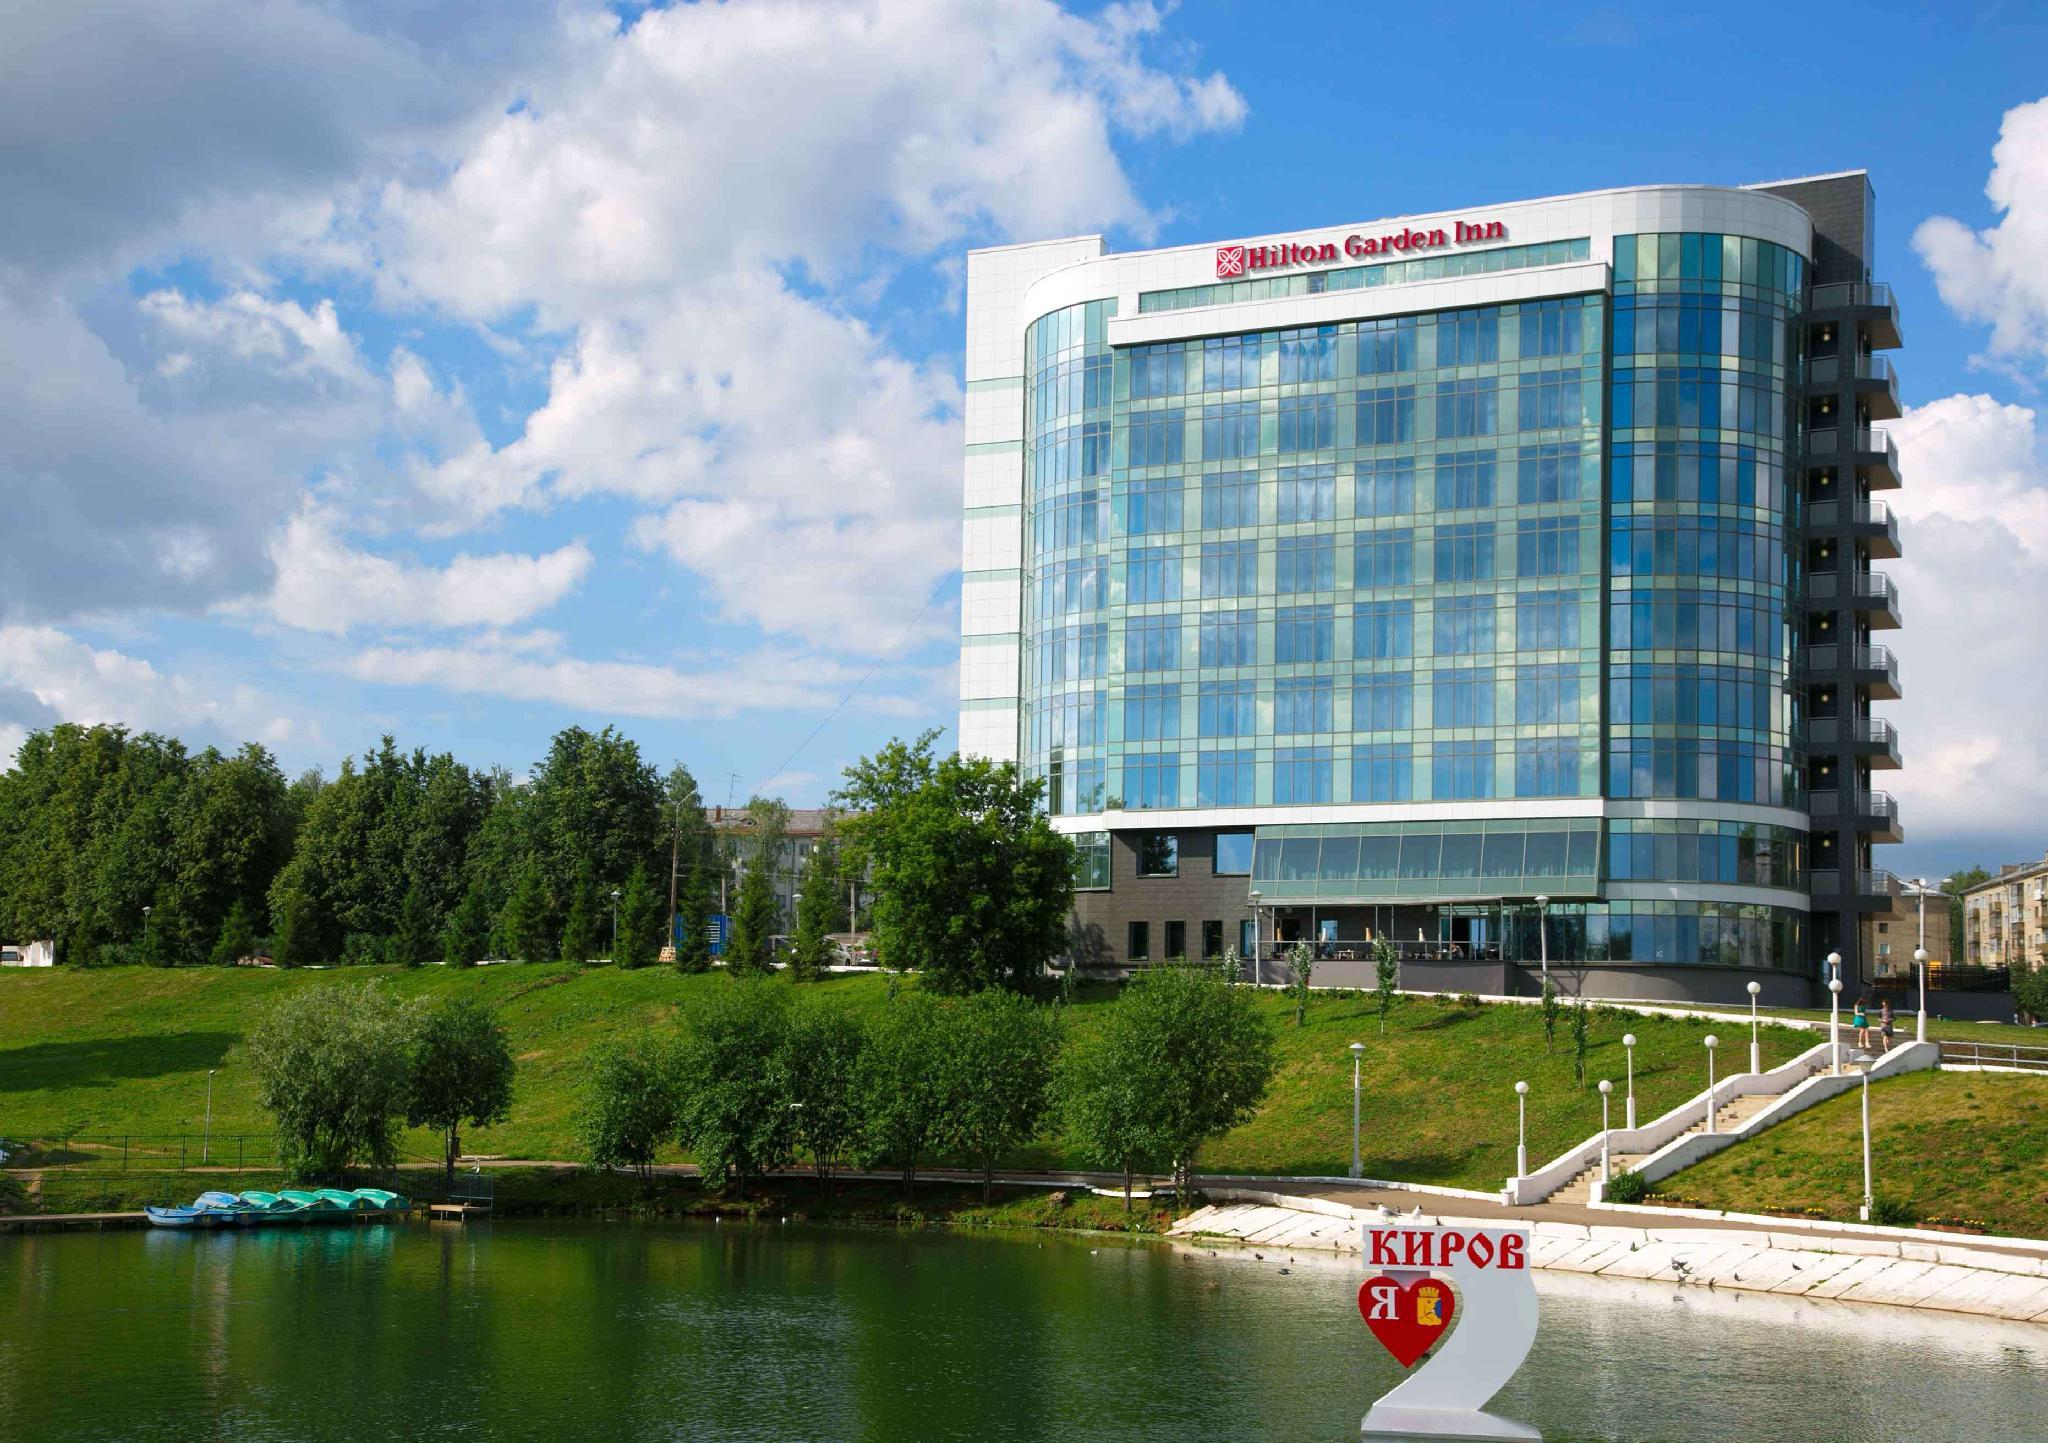 Hilton Garden Inn Kirov